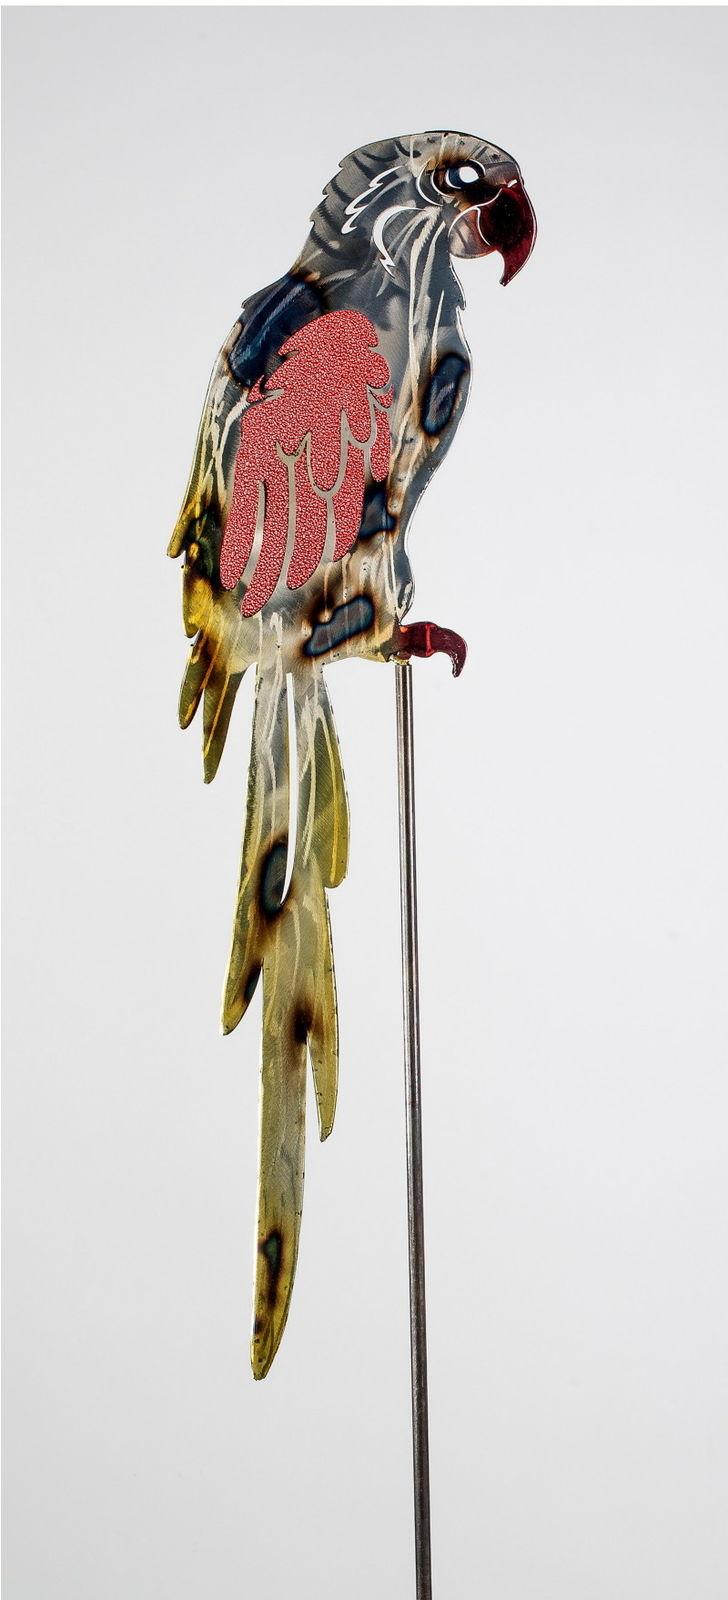 Gartenstecker papagei metall glas gartendeko beetstecker for Gartendeko metall vogel